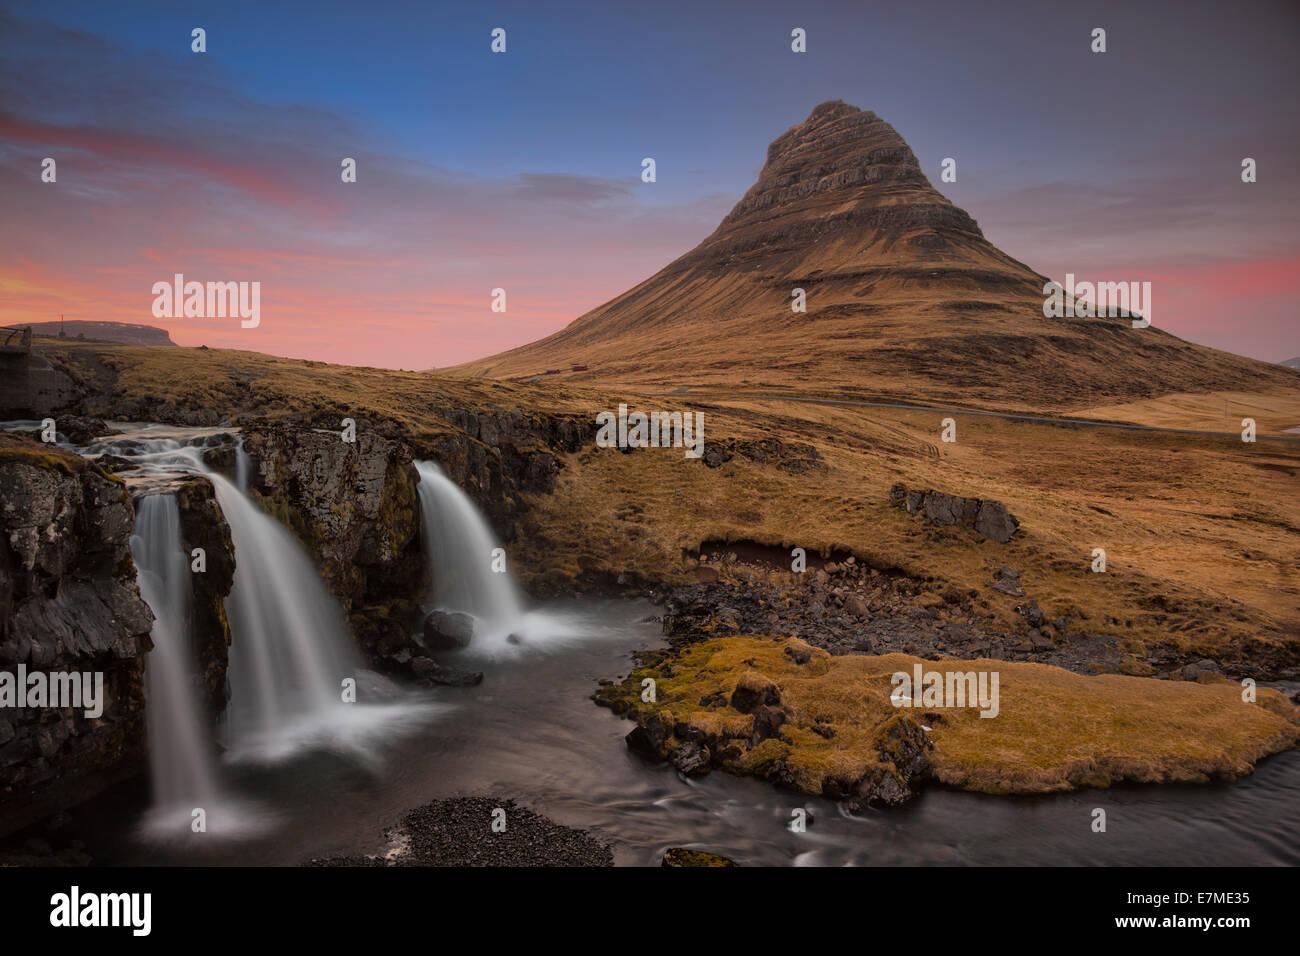 The Kirkjufell mountain and waterfall near Grundarfjordur in twilight, Snaefellsnes Peninsula, in western Iceland. - Stock Image